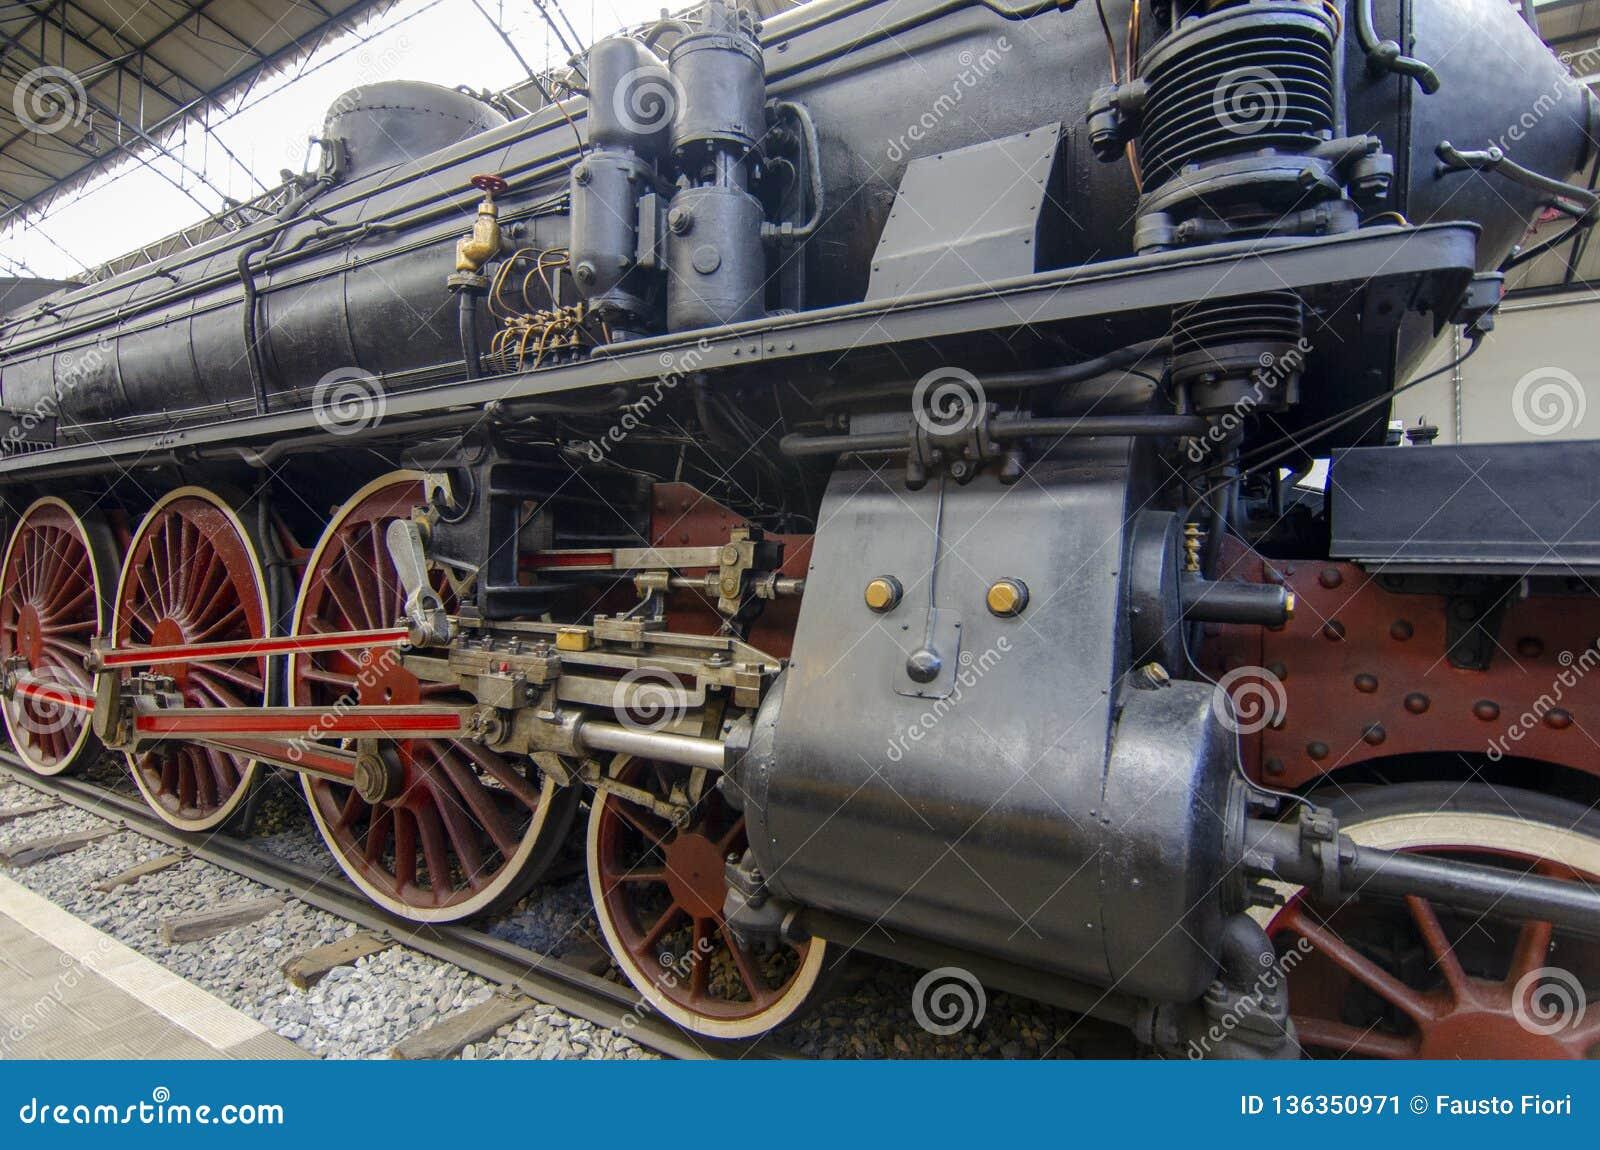 Museo Scienza E Tecnica.Steam Locomotive Stock Image Image Of Steam View Museo 136350971